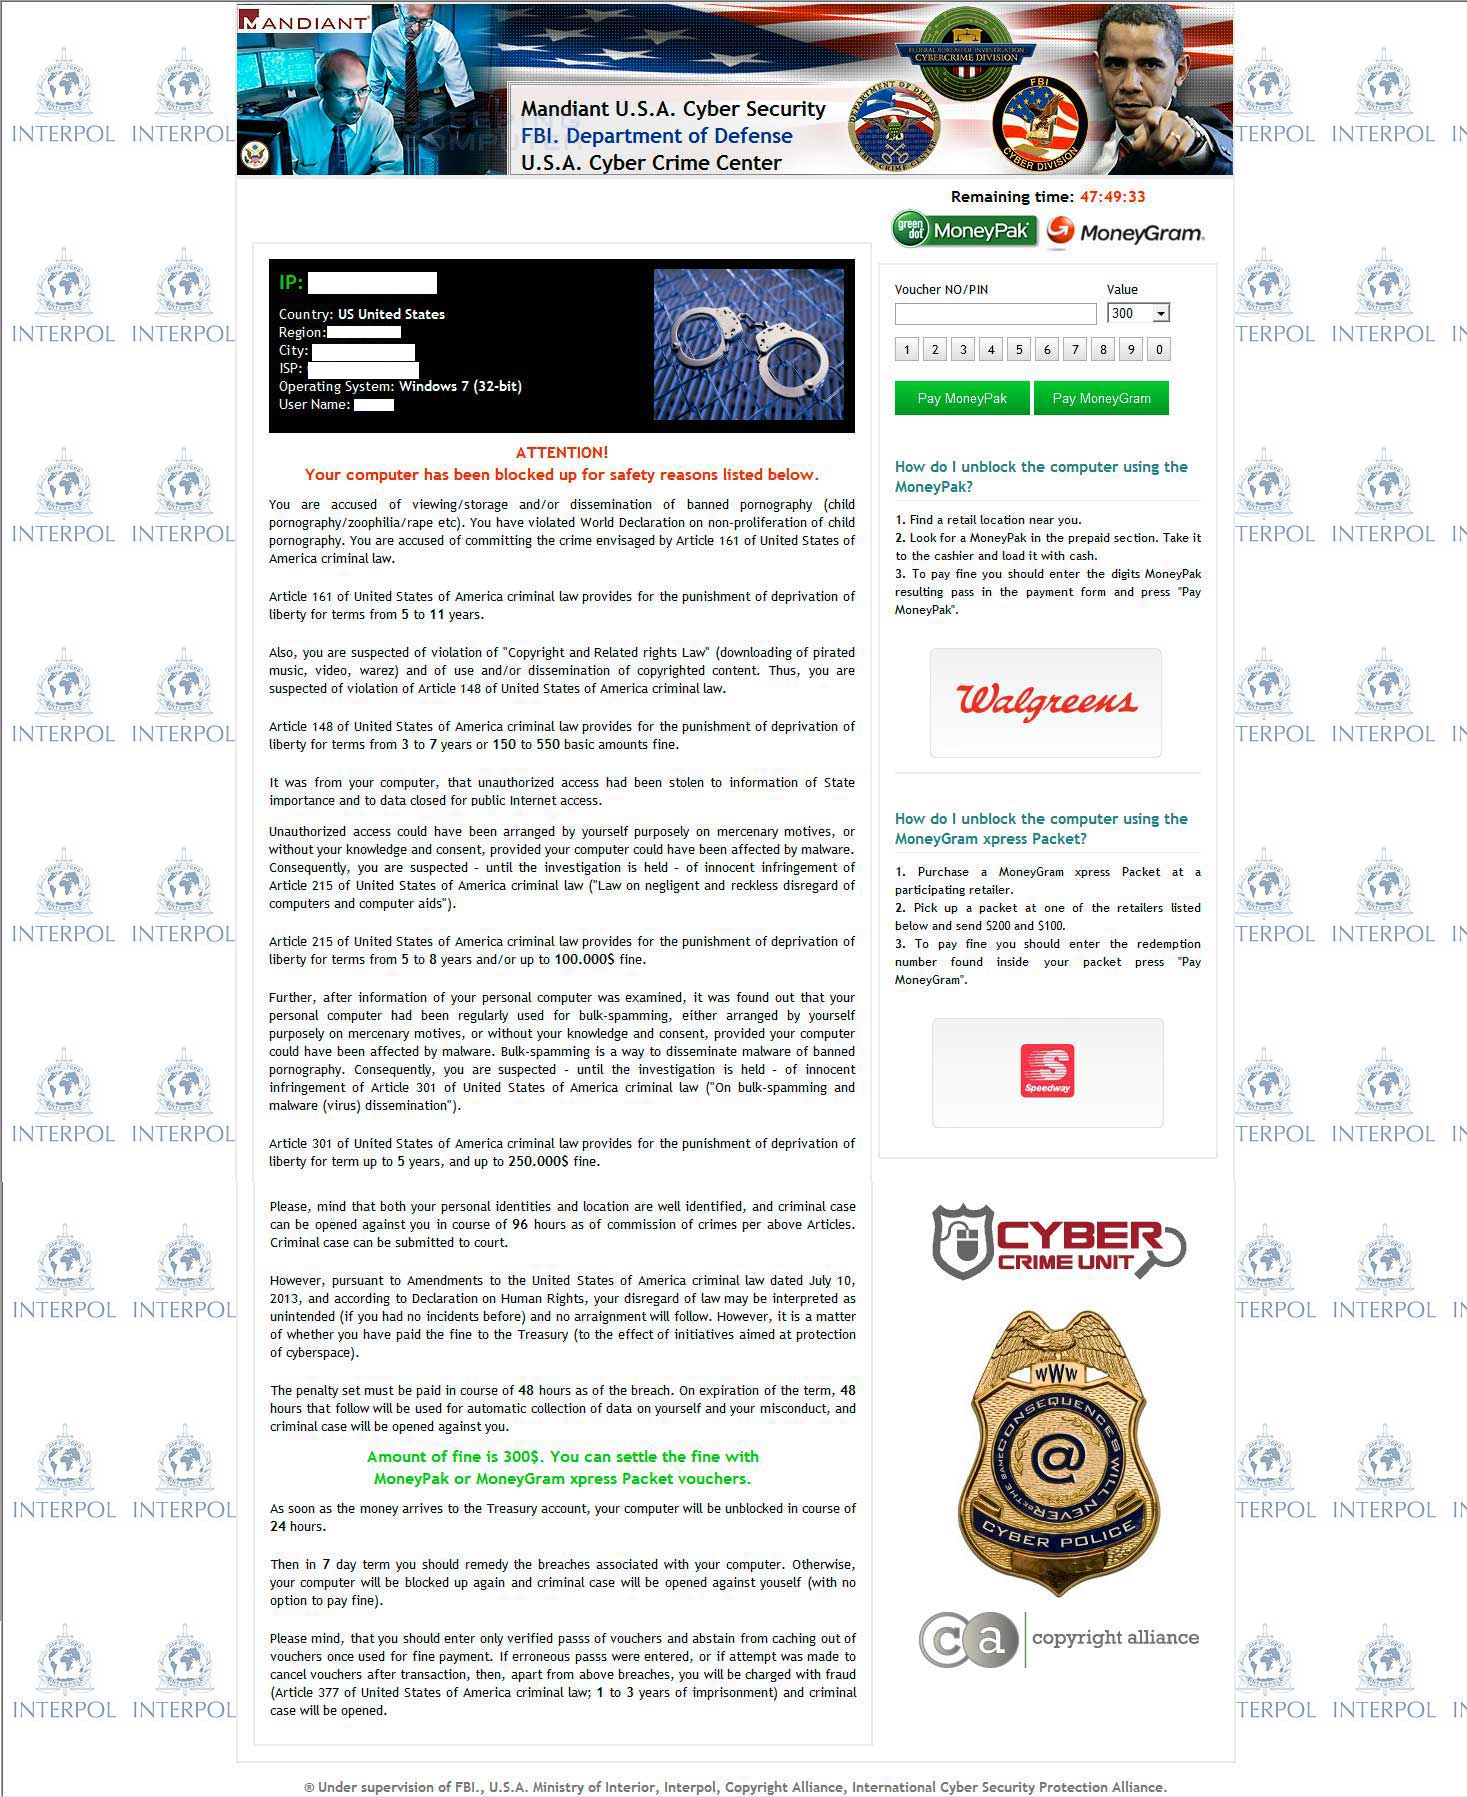 Mandiant U.S.A Cyber Security Ransomware screen shot